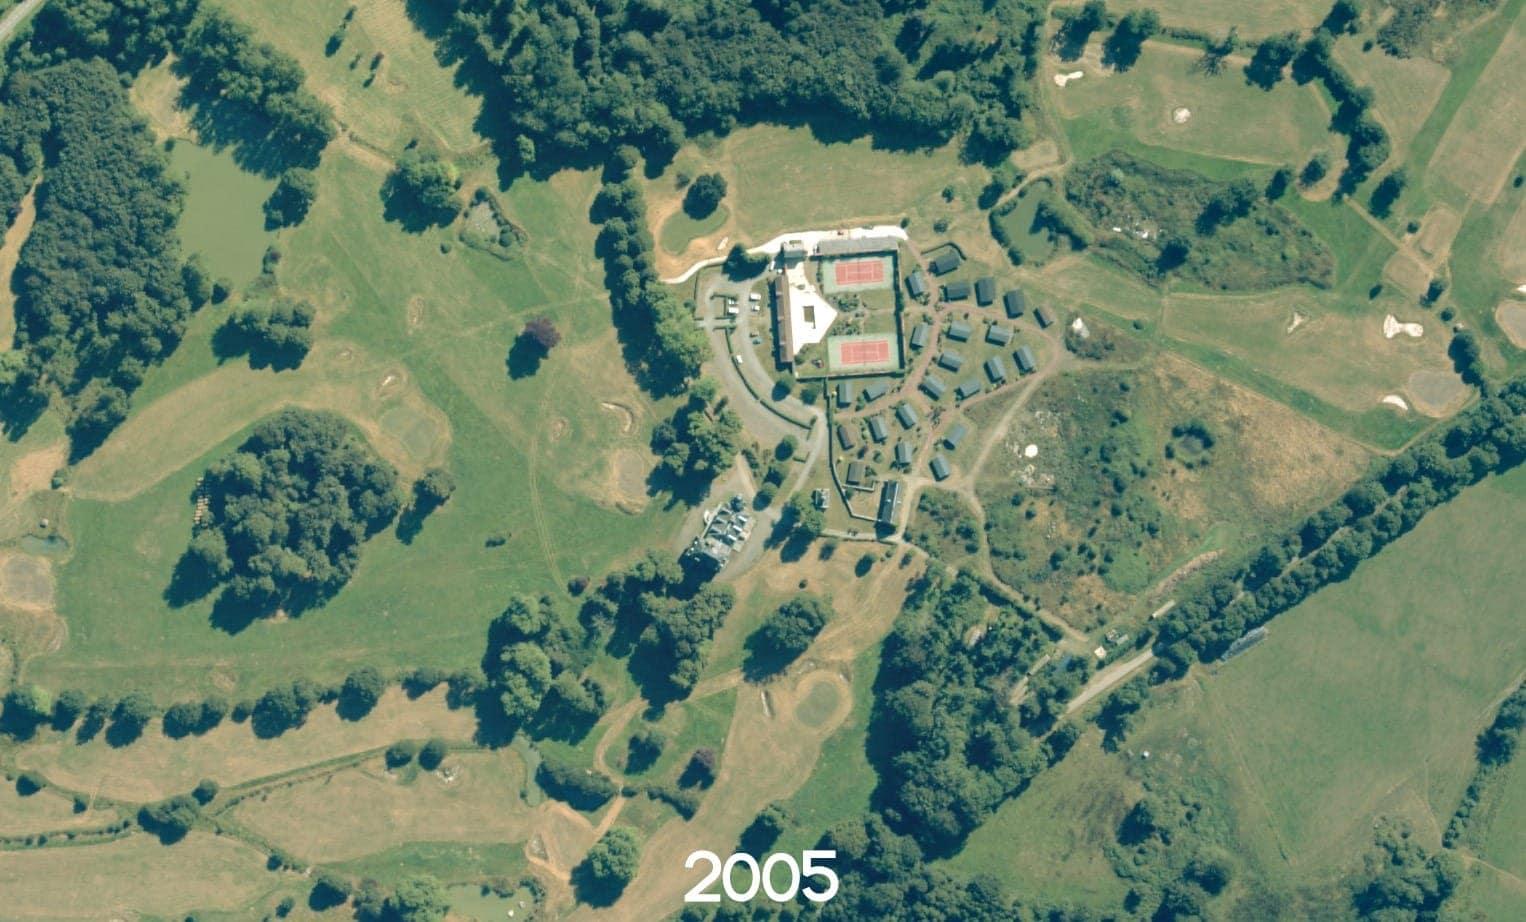 chateau-marko-bey-before-map-2005